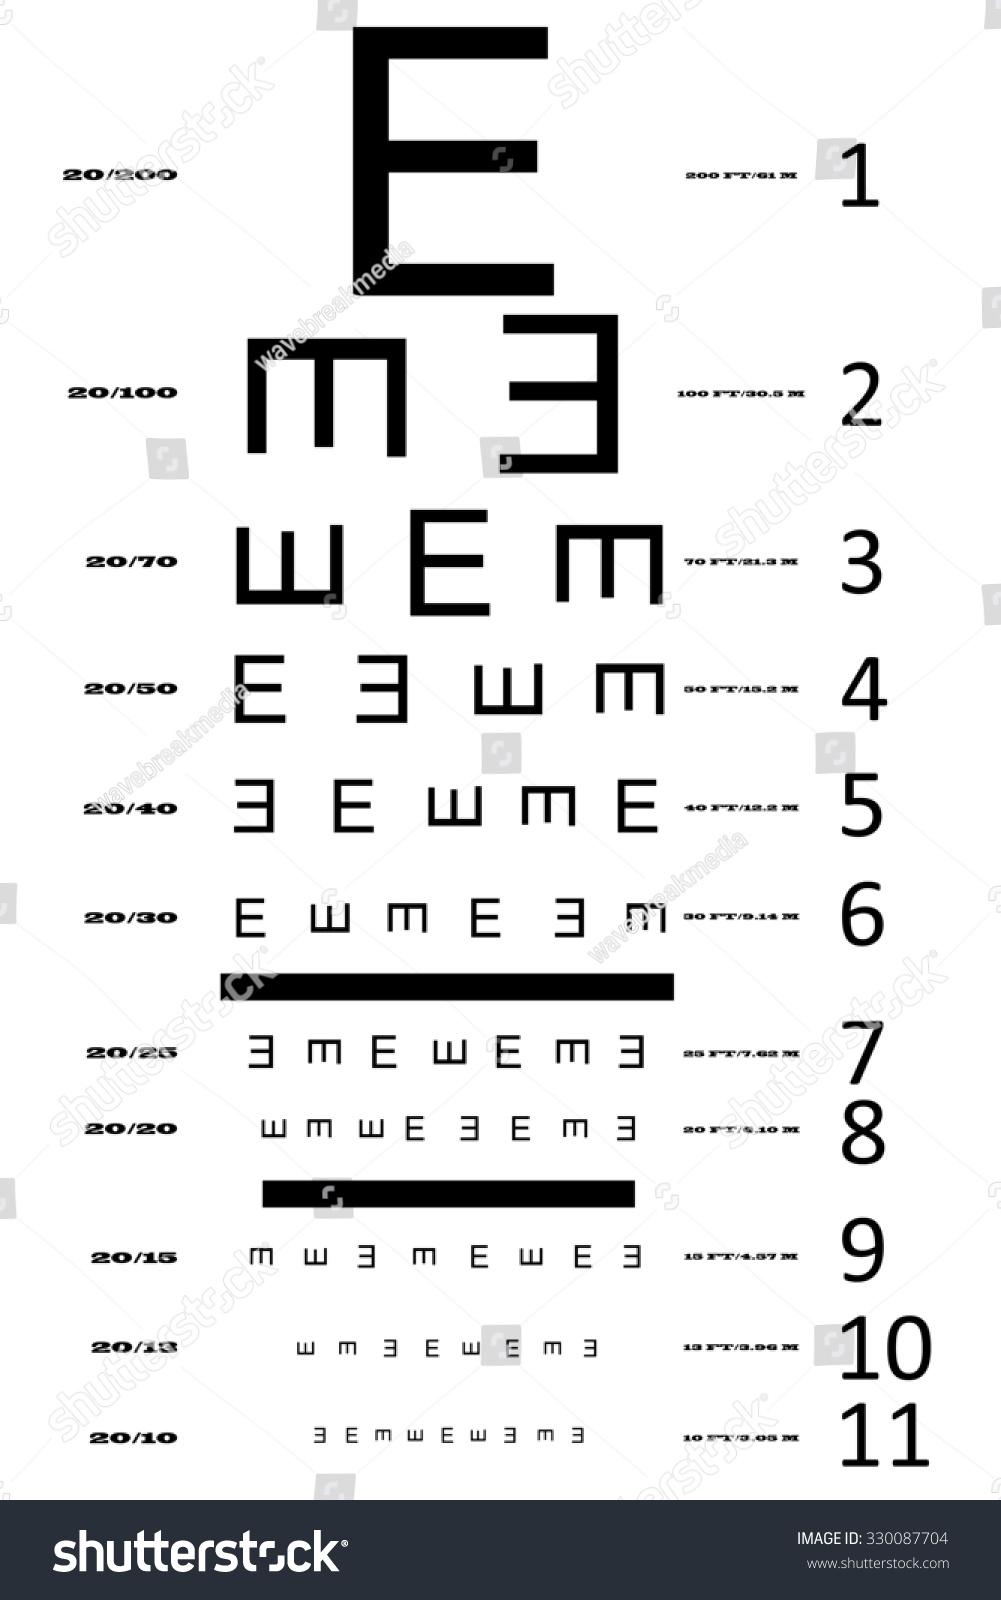 e19356a28c5 Royalty free stock illustration of eye sight test chart multiple jpg  1001x1600 Standard eye exam chart